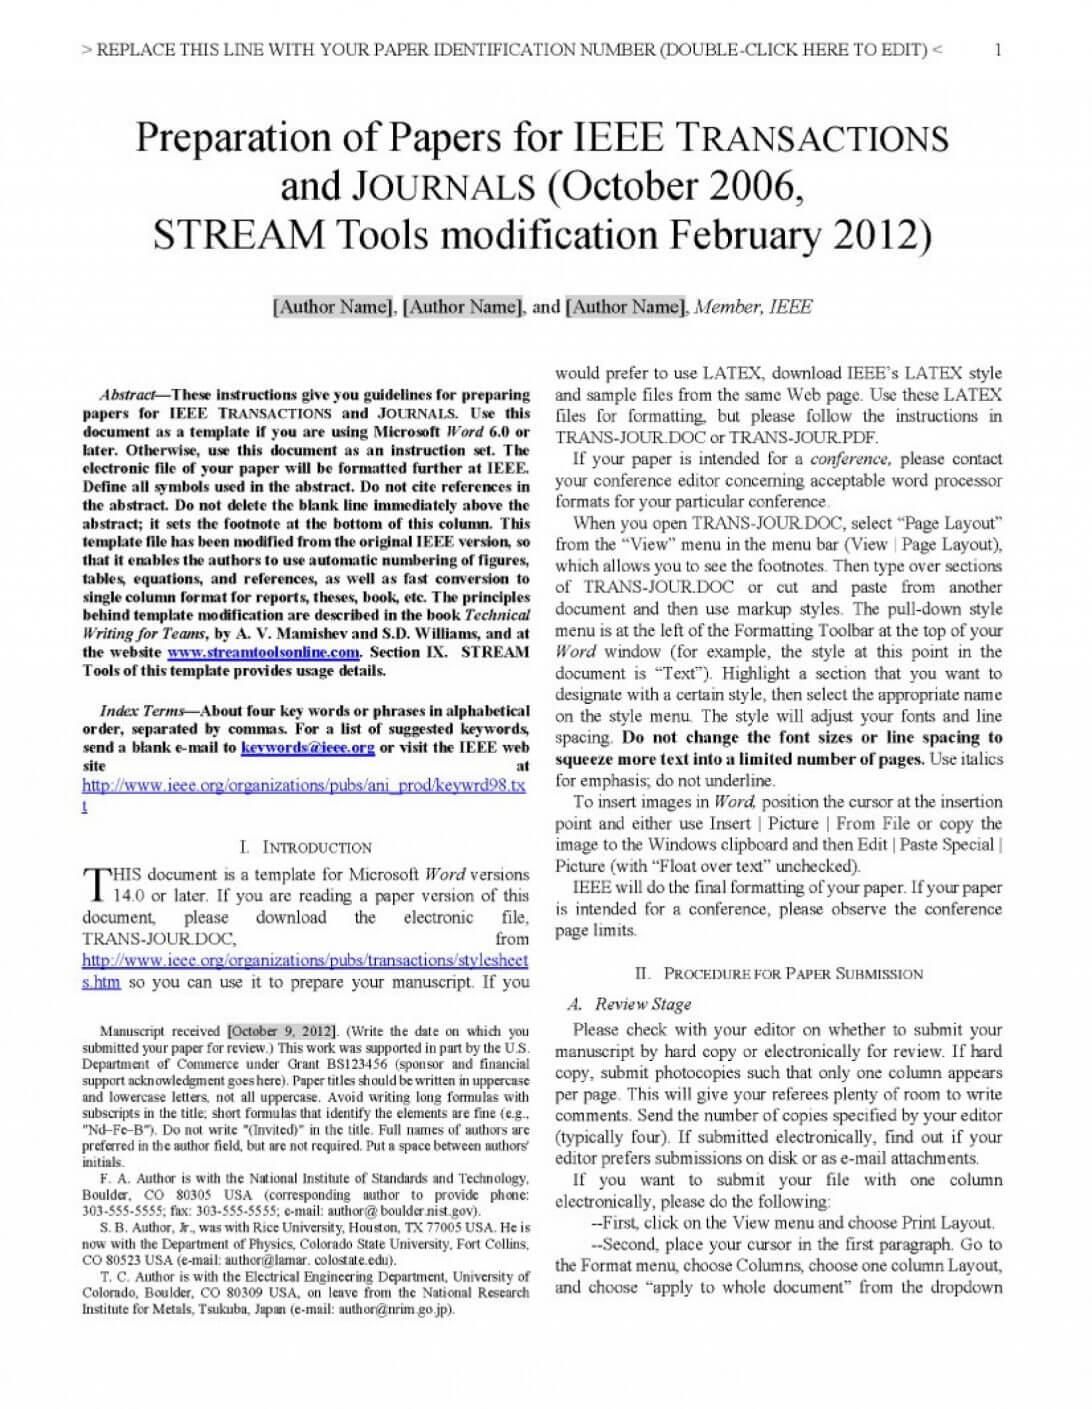 APA Style Paper - Buy APA Paper Online | Ultius